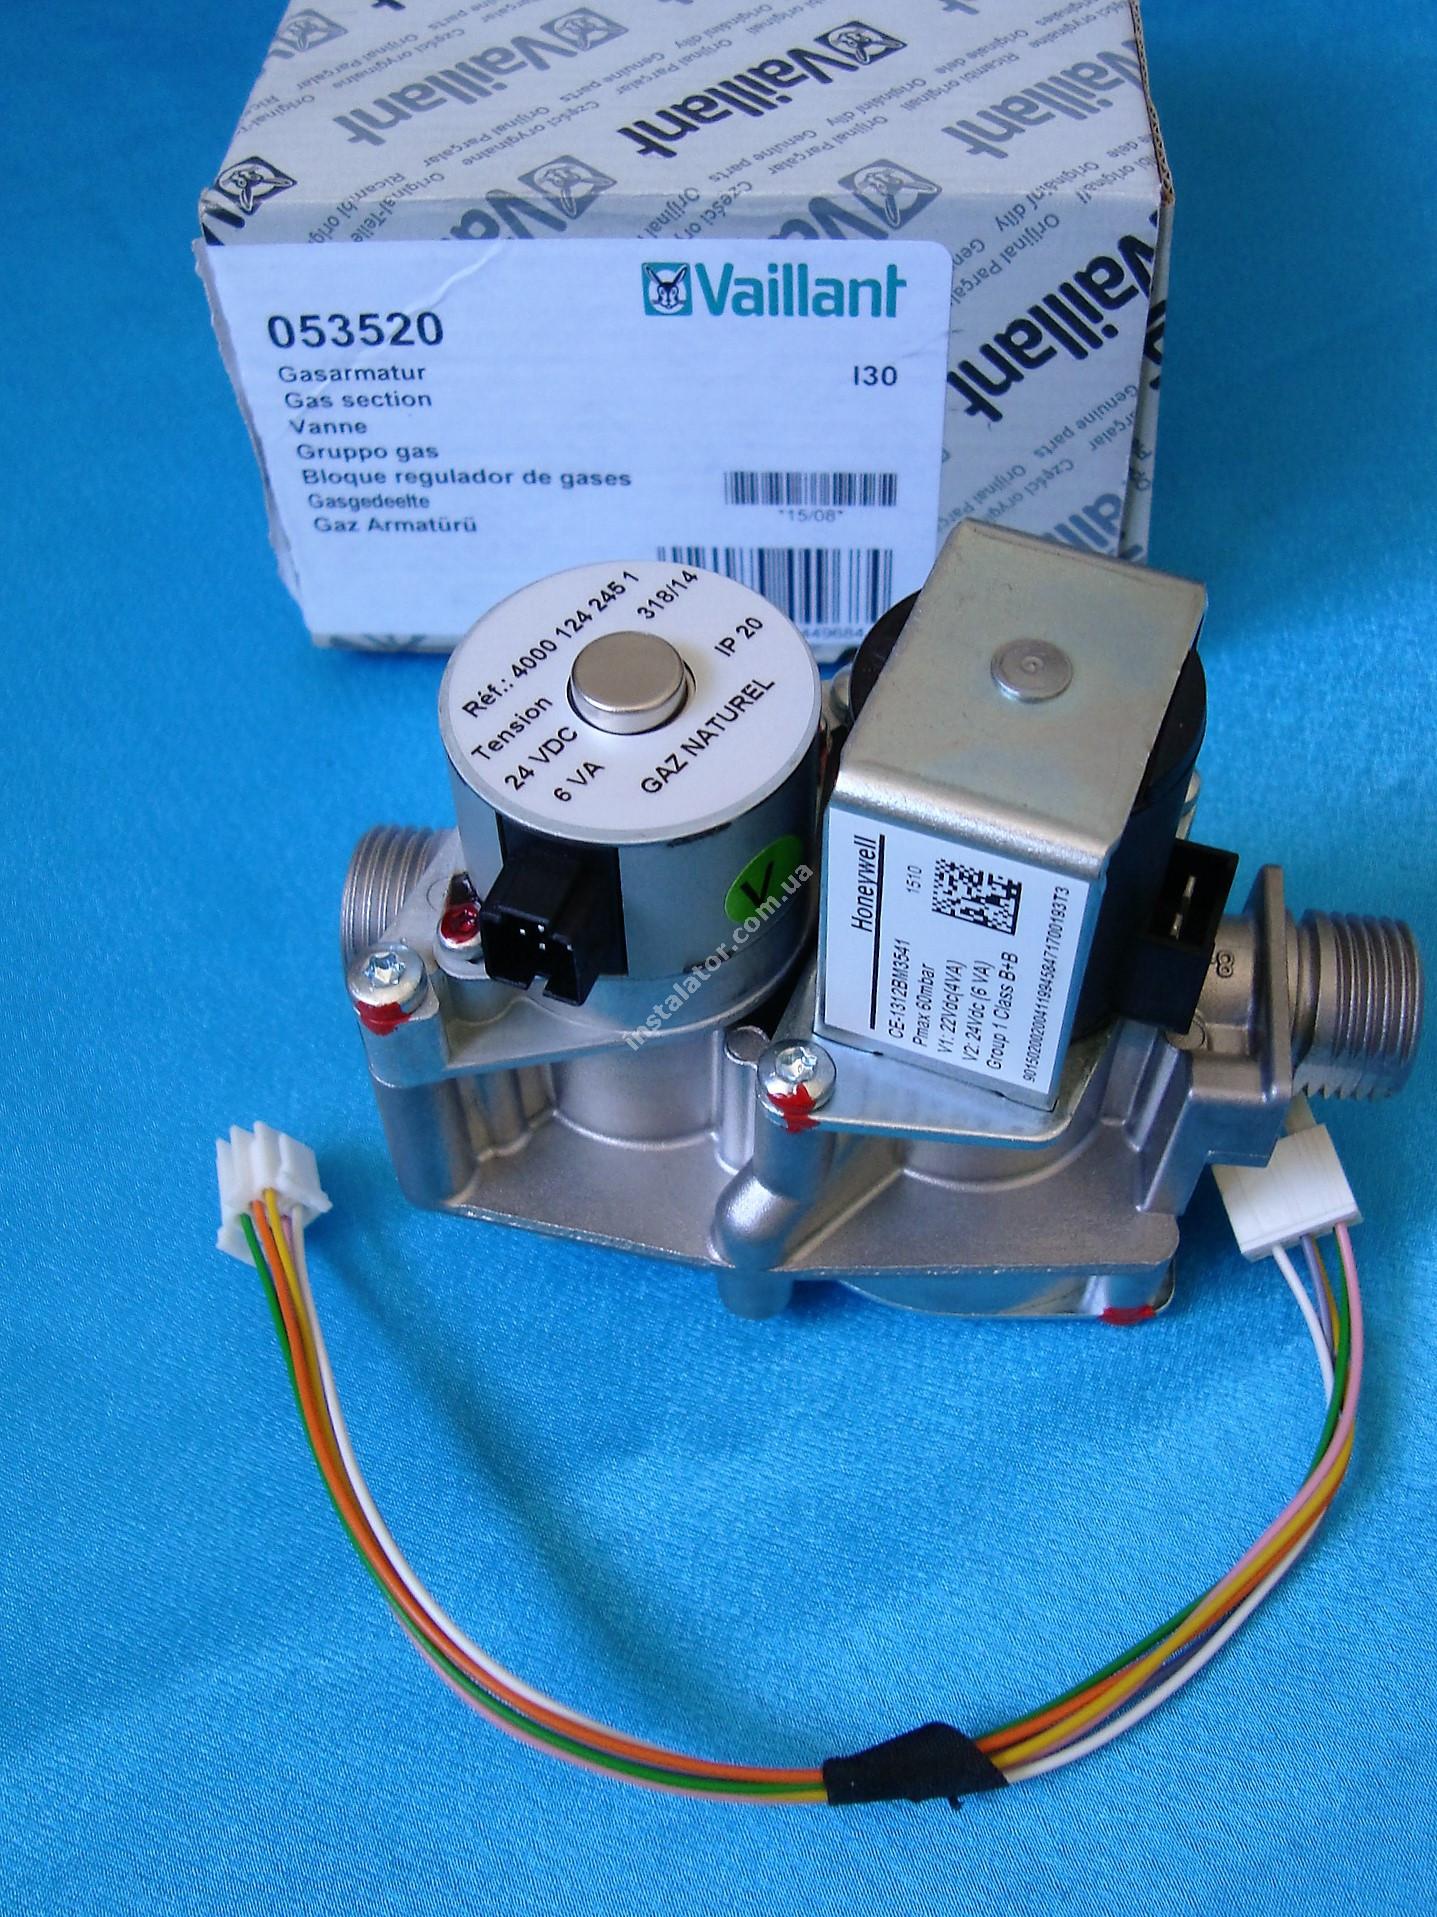 053520 Газовий клапан колонки VAILLANT MAG 16-0/0 XEA G20 (HONEYWELL CE-1312BM354) full-image-2